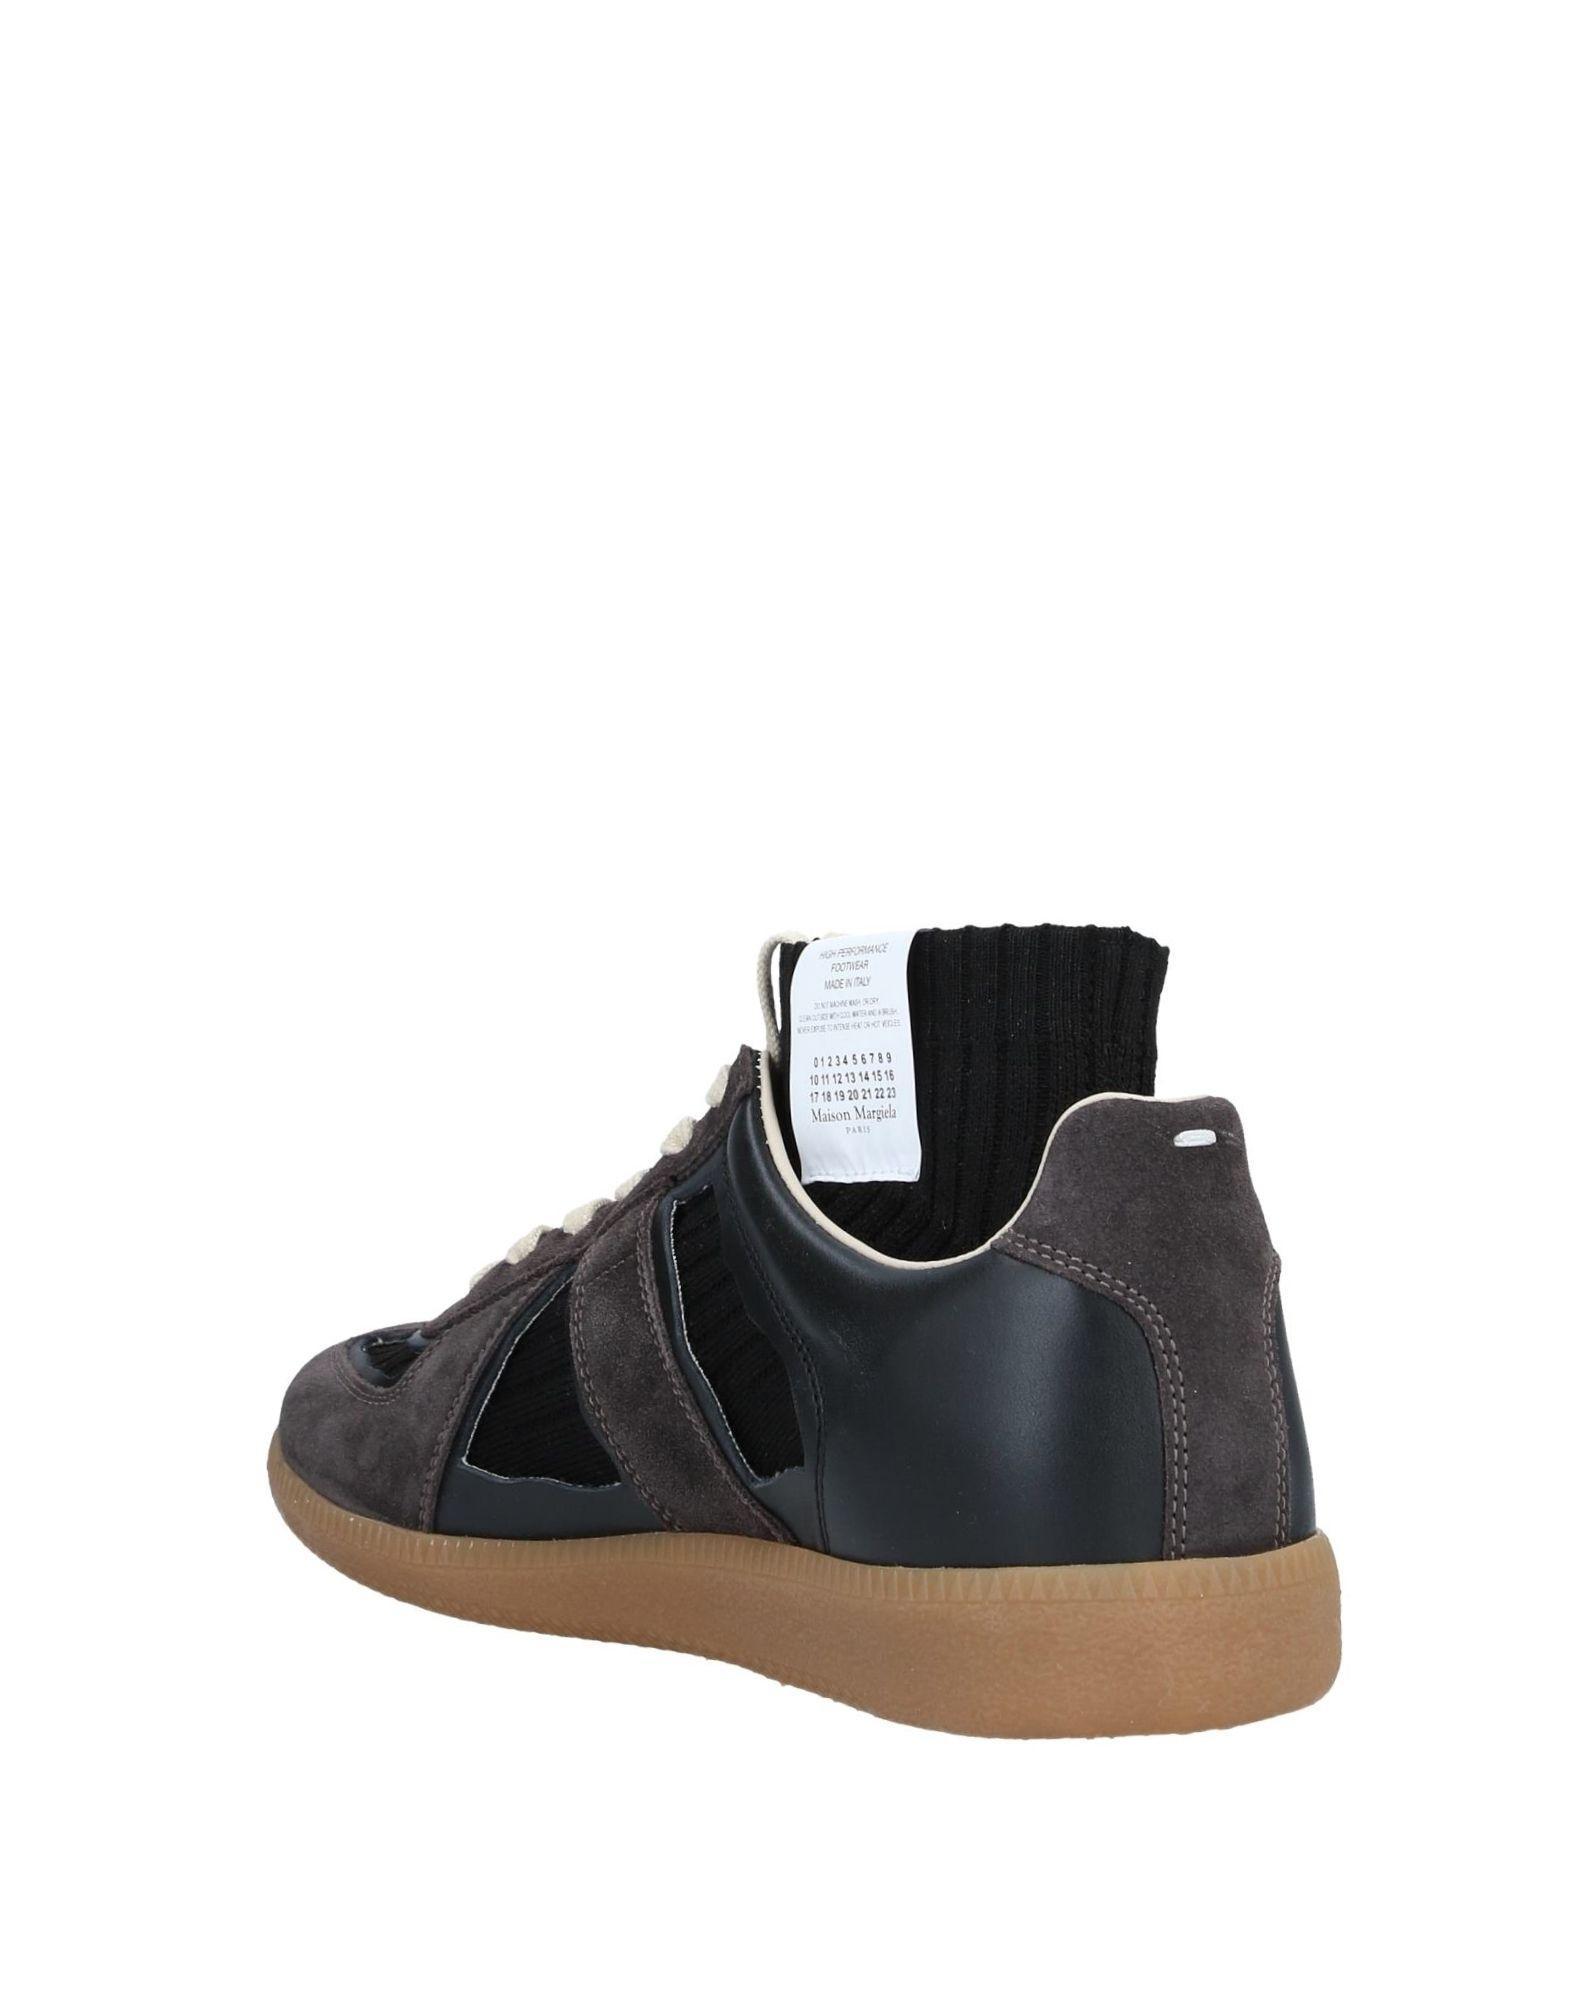 Sneakers abotinadas Maison Margiela de hombre de color Negro